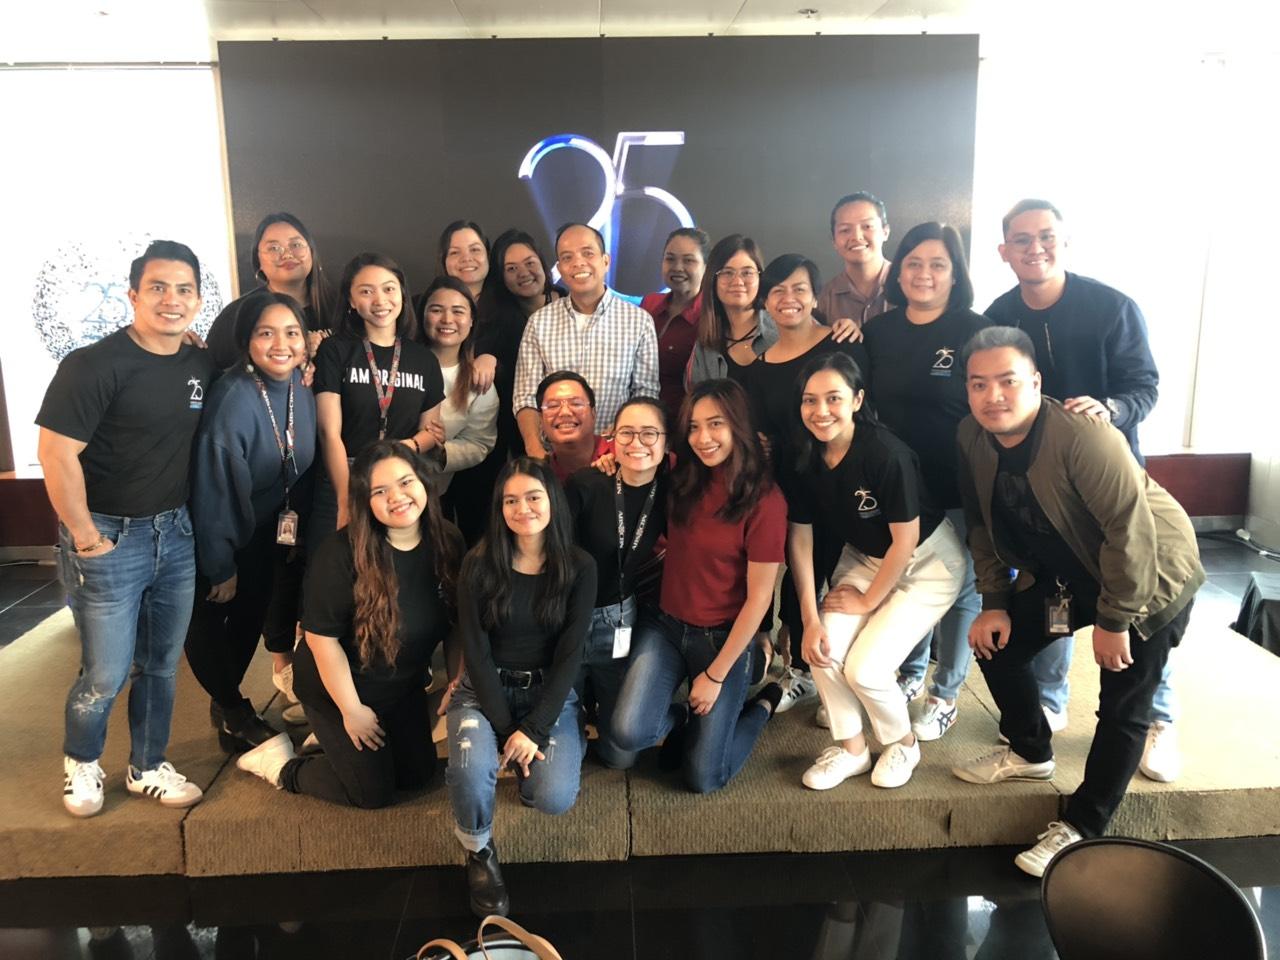 Cinema One celebrates 25 years of saluting Filipino films